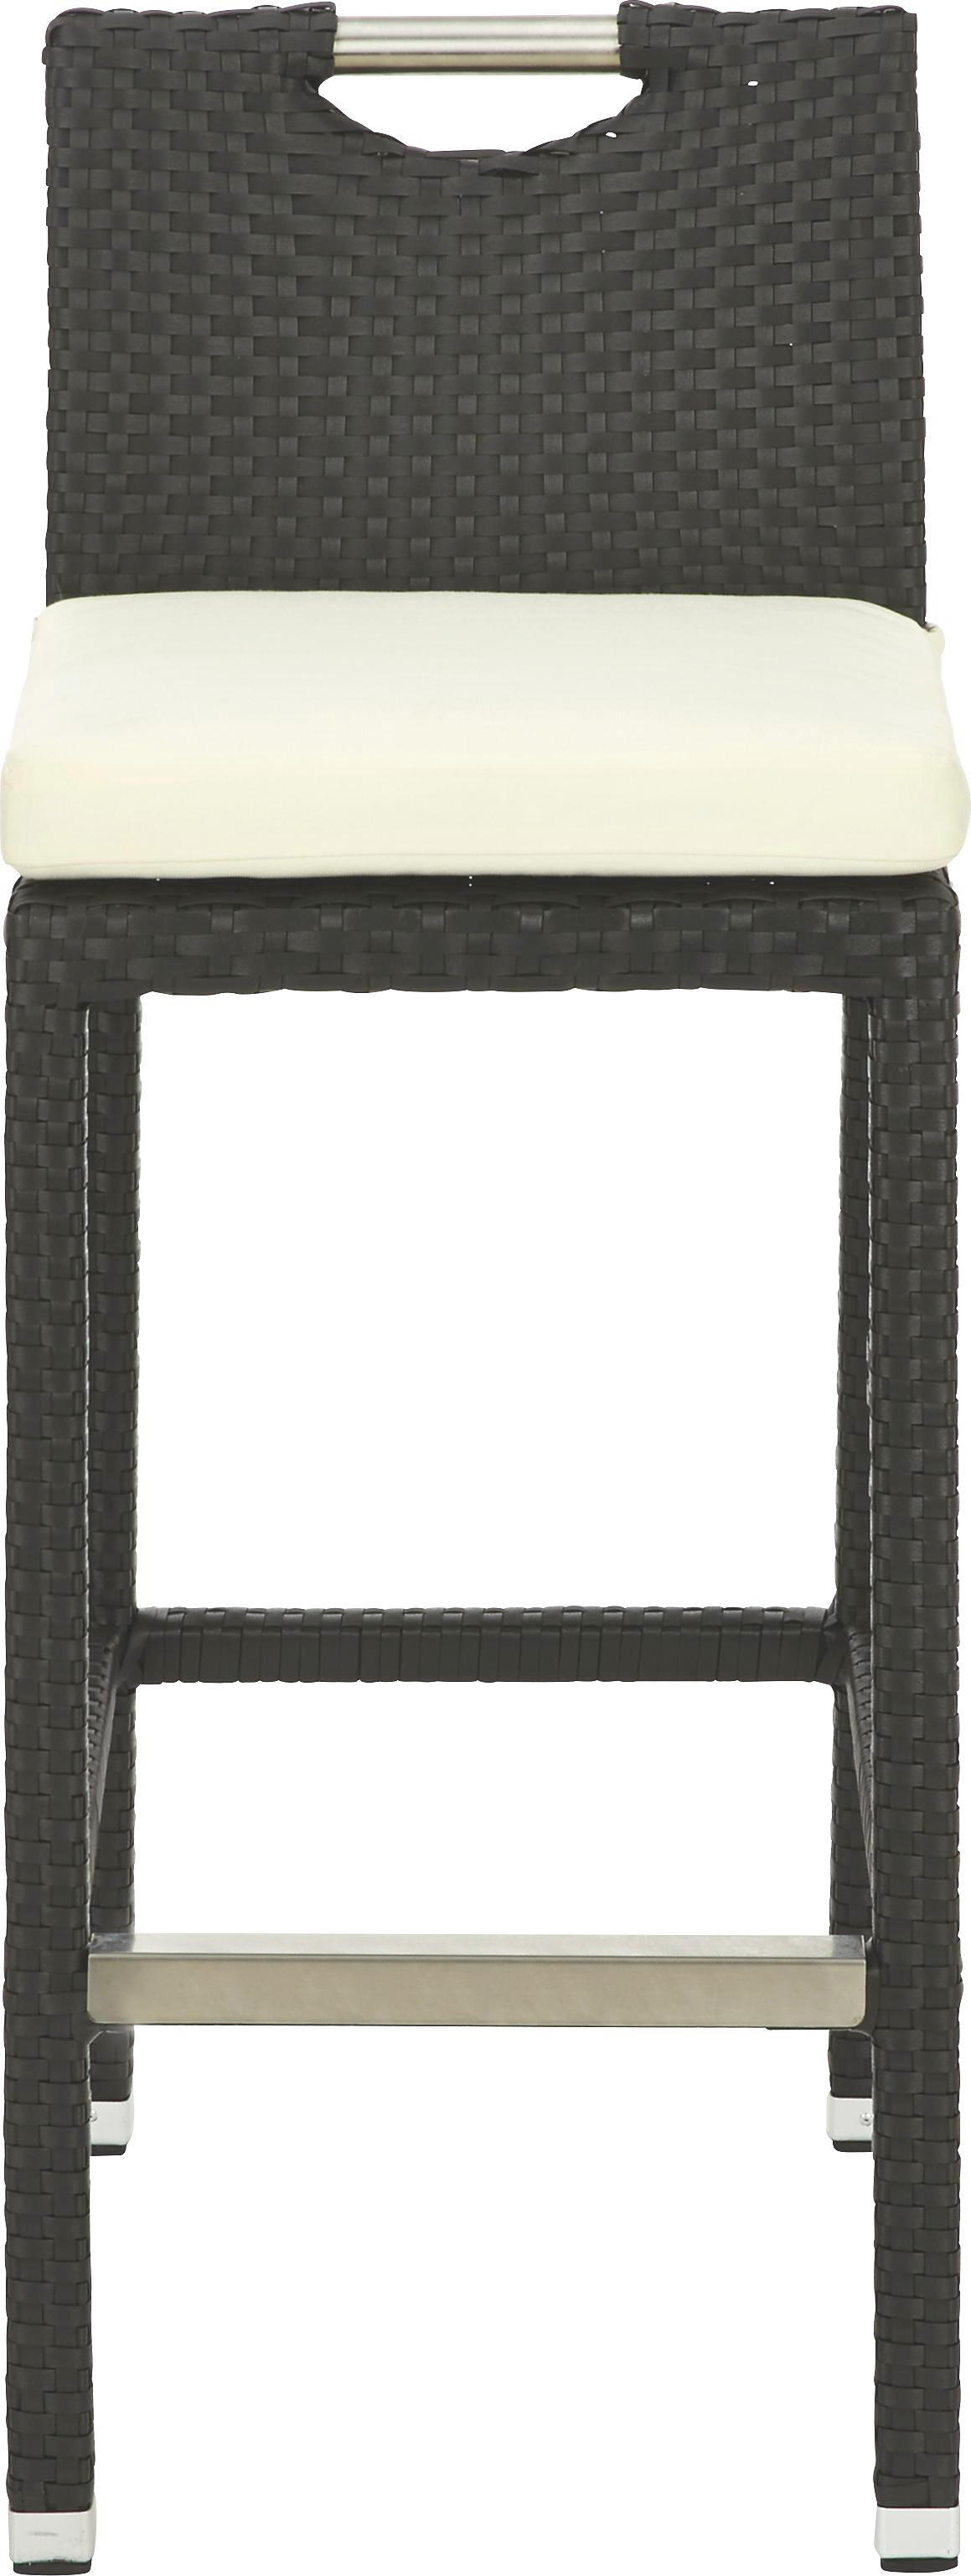 BARSKA STOLICA - crna, Design, metal/tekstil (40/100/50cm) - AMBIA GARDEN